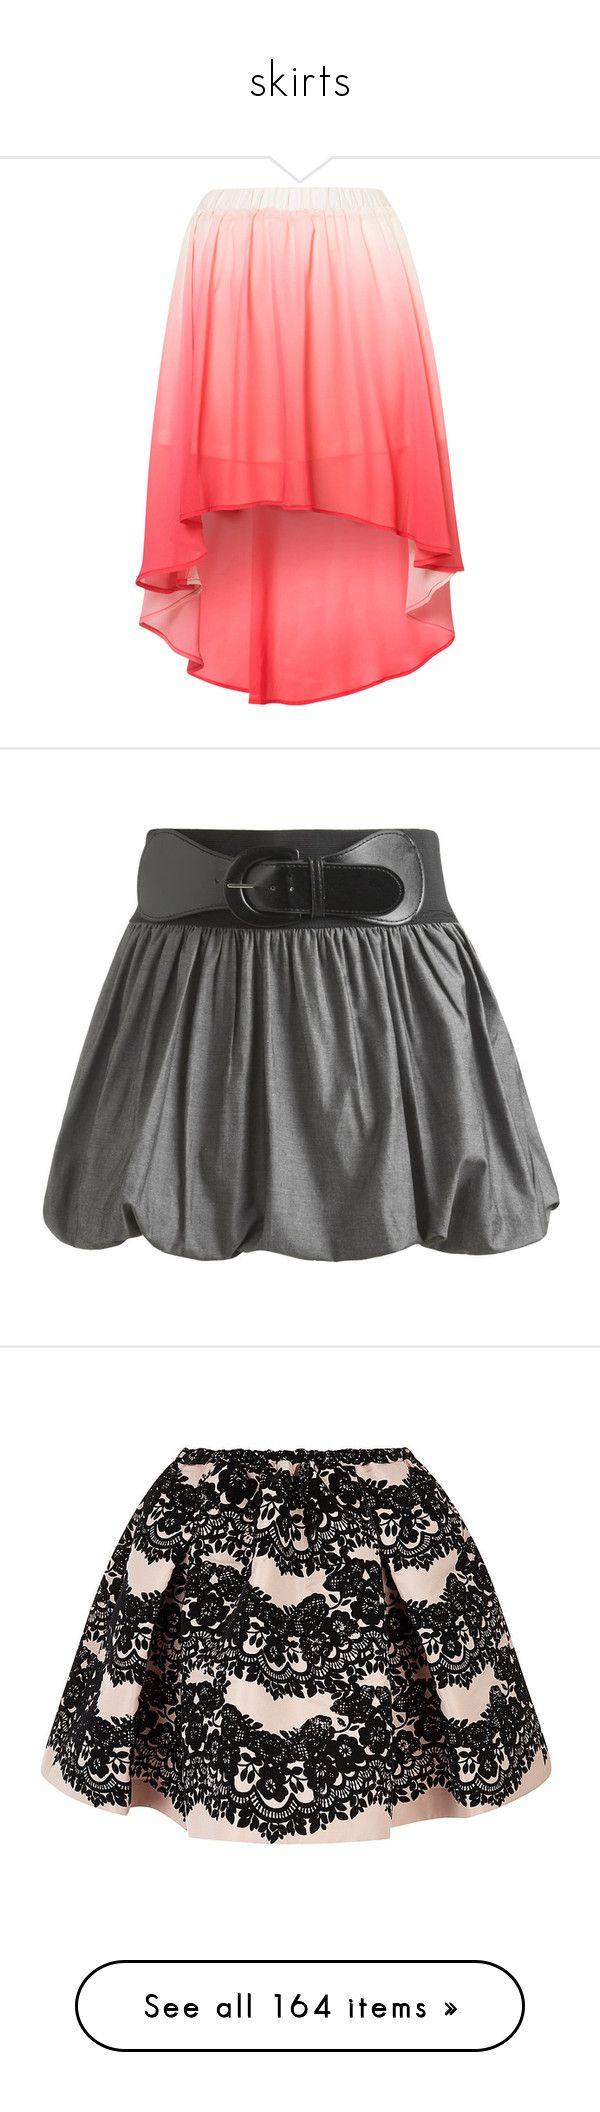 """skirts"" by yumikochan ❤ liked on Polyvore featuring skirts, bottoms, saias, topshop, ariya, dip dye skirt, pink skirt, red skirts, mini skirts and faldas"